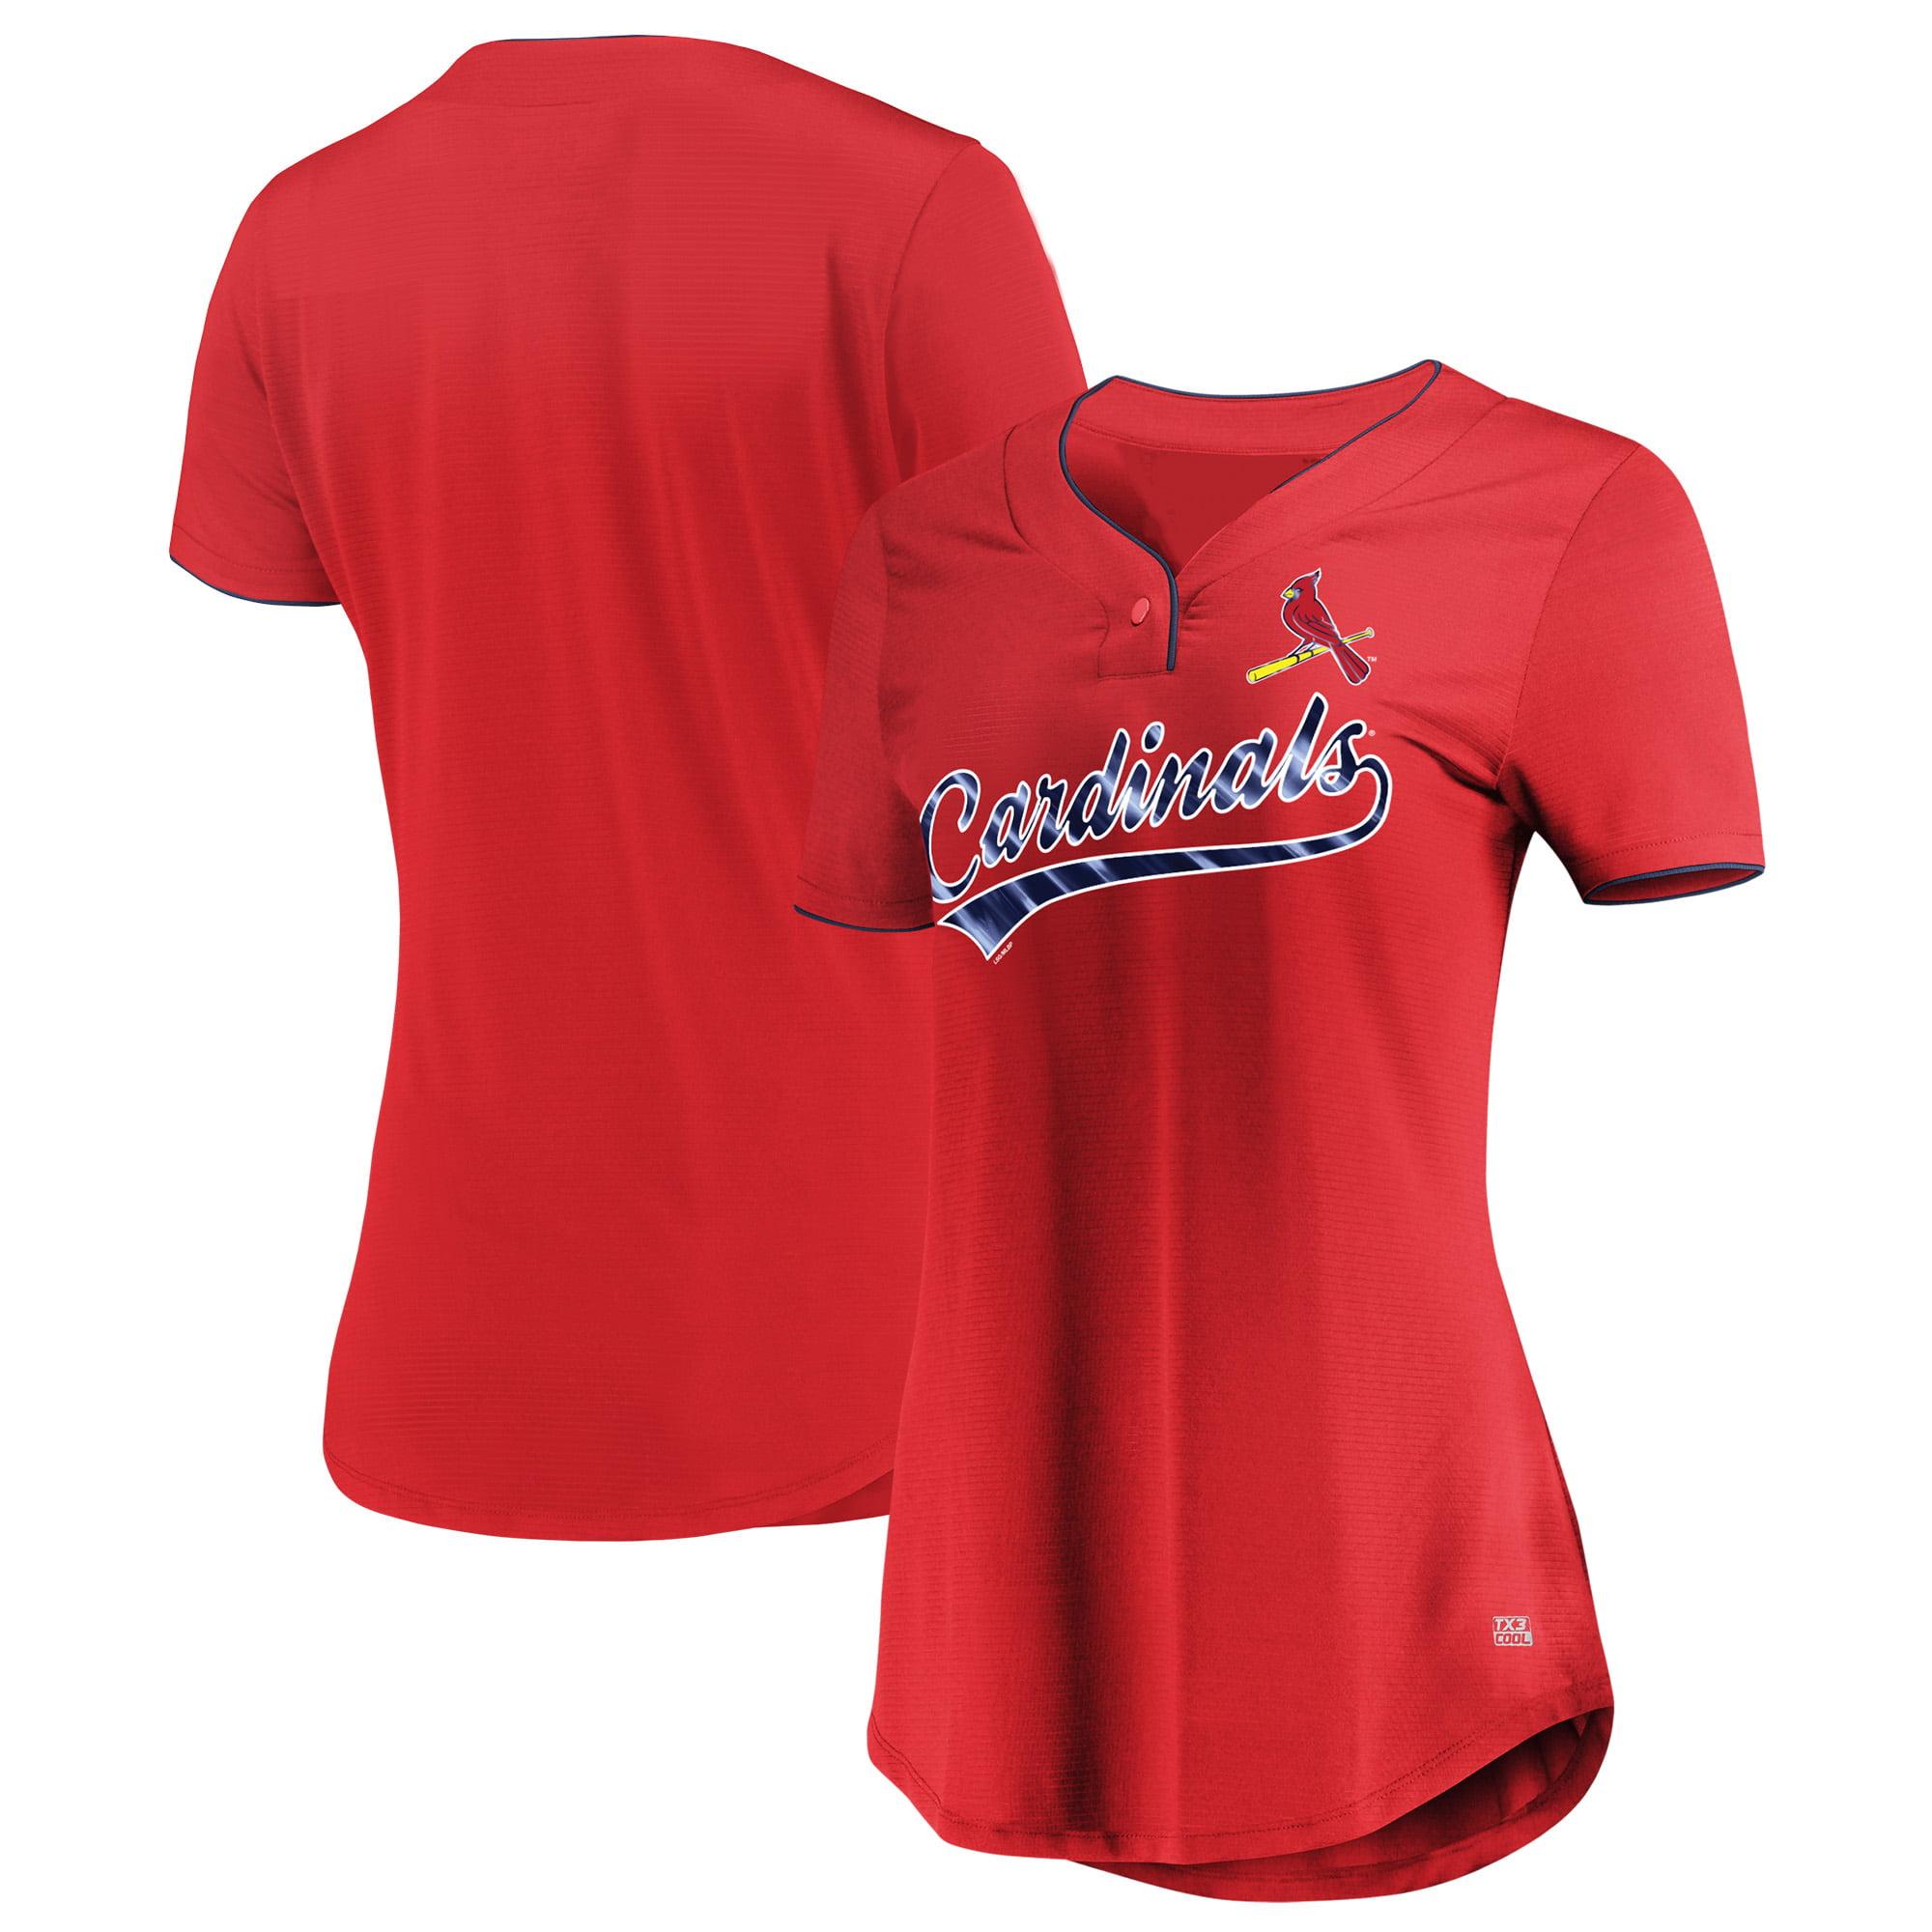 08233eda809 St. Louis Cardinals Team Shop - Walmart.com